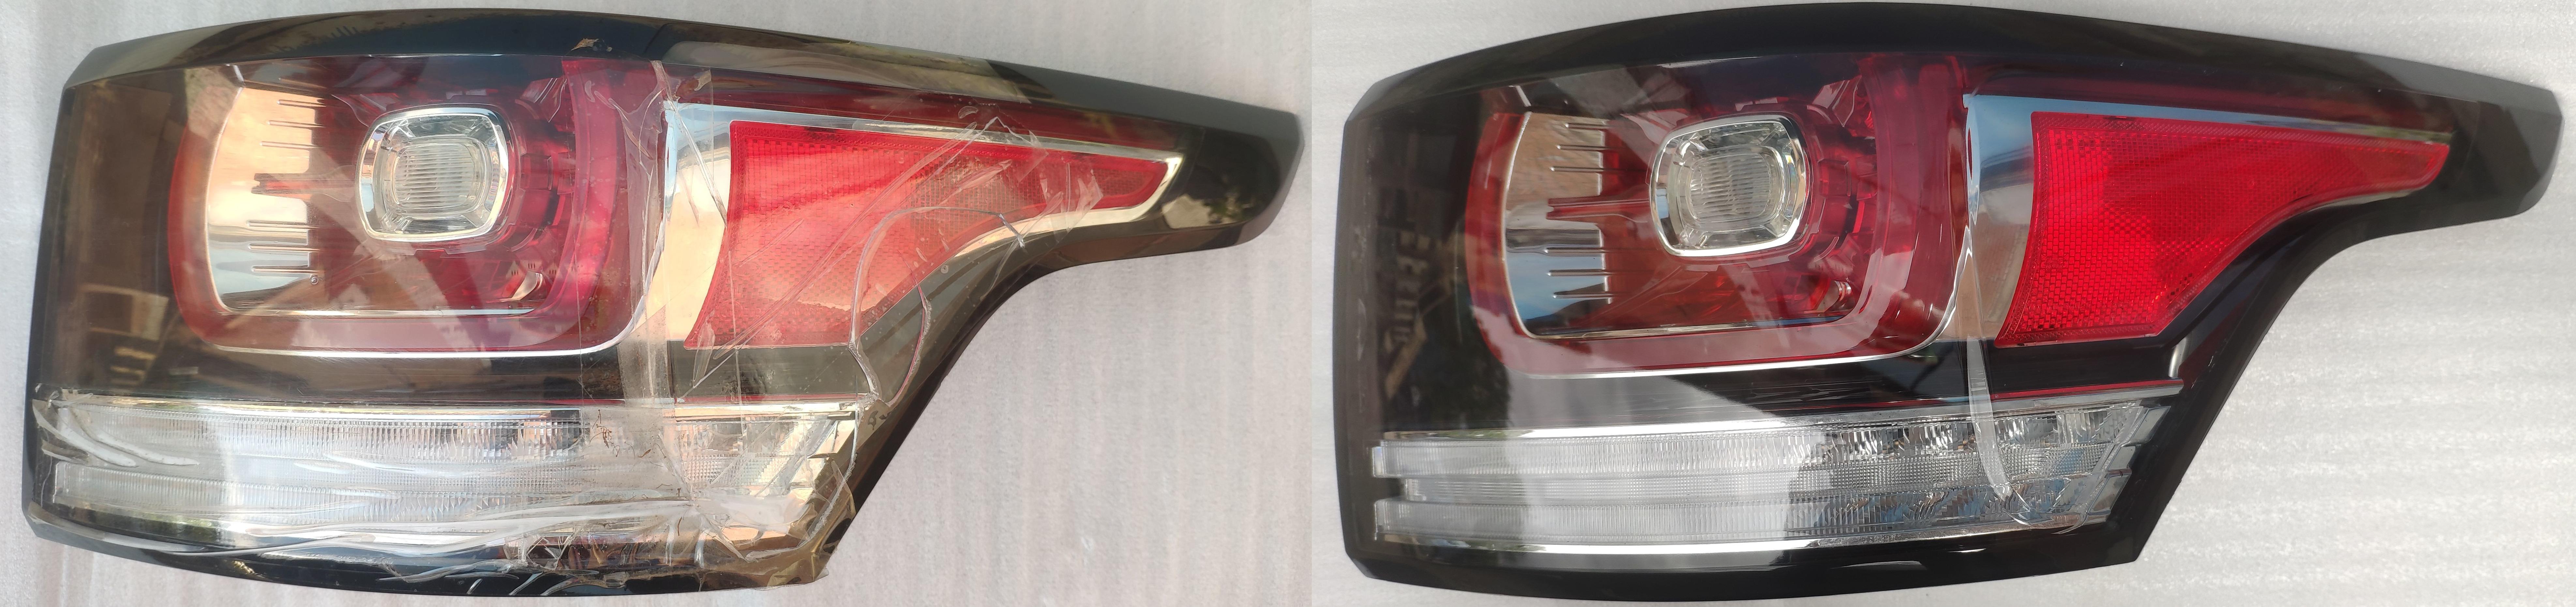 Стекло заднего фонаря Range Rover Sport L494 2013